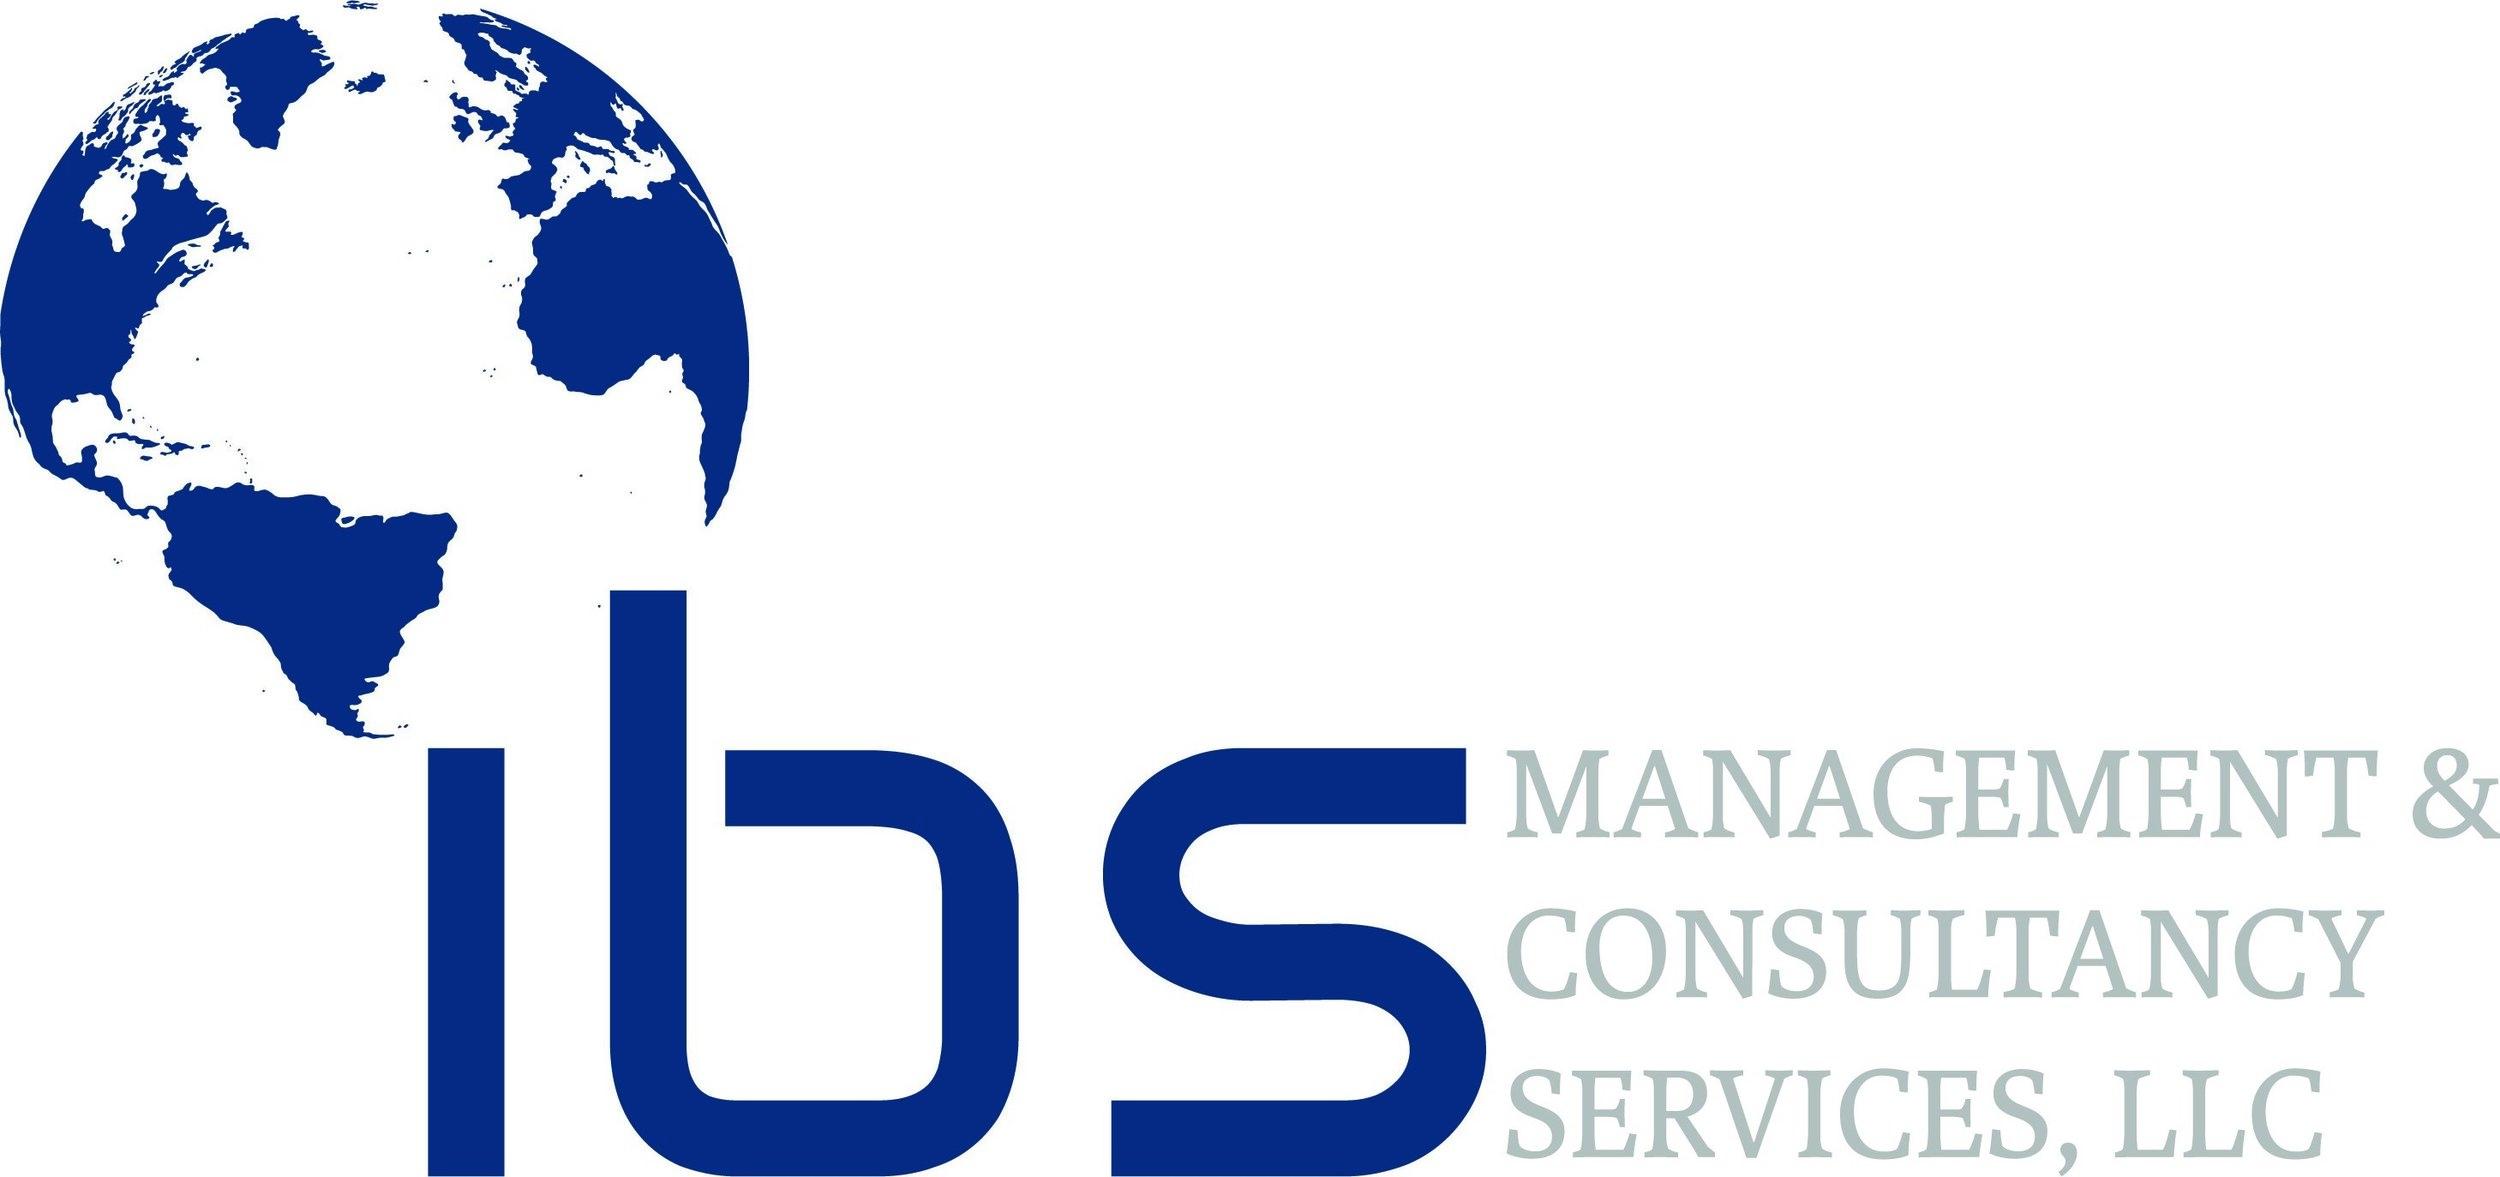 IBS Logo horizontal 300dpi.jpg